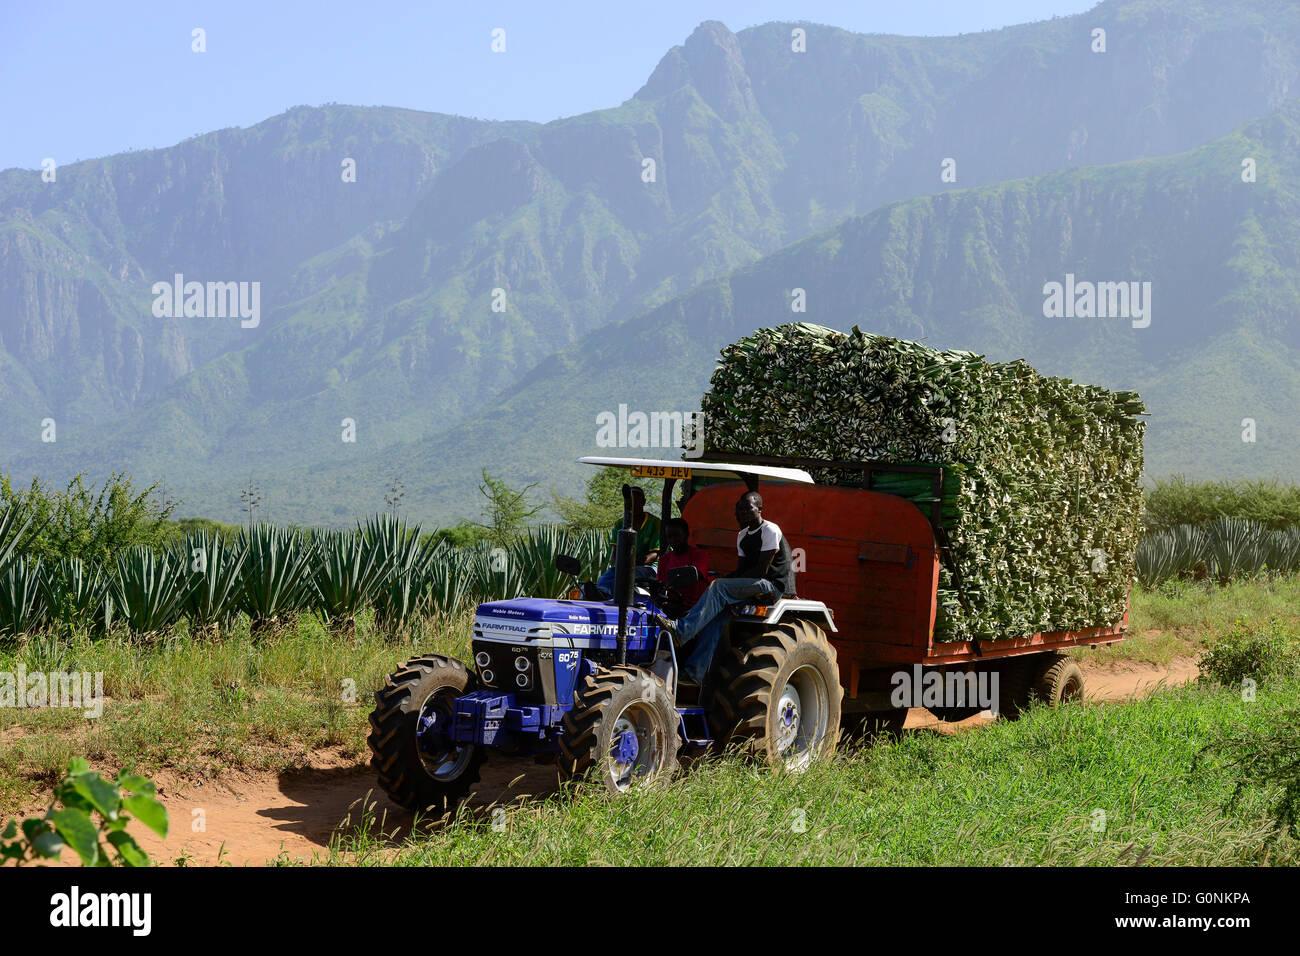 TANZANIA Tanga, Usambara Mountains, Sisal farming and industry, D.D. Ruhinda & Company Ltd., Mkumbara Sisal estate, Stock Photo